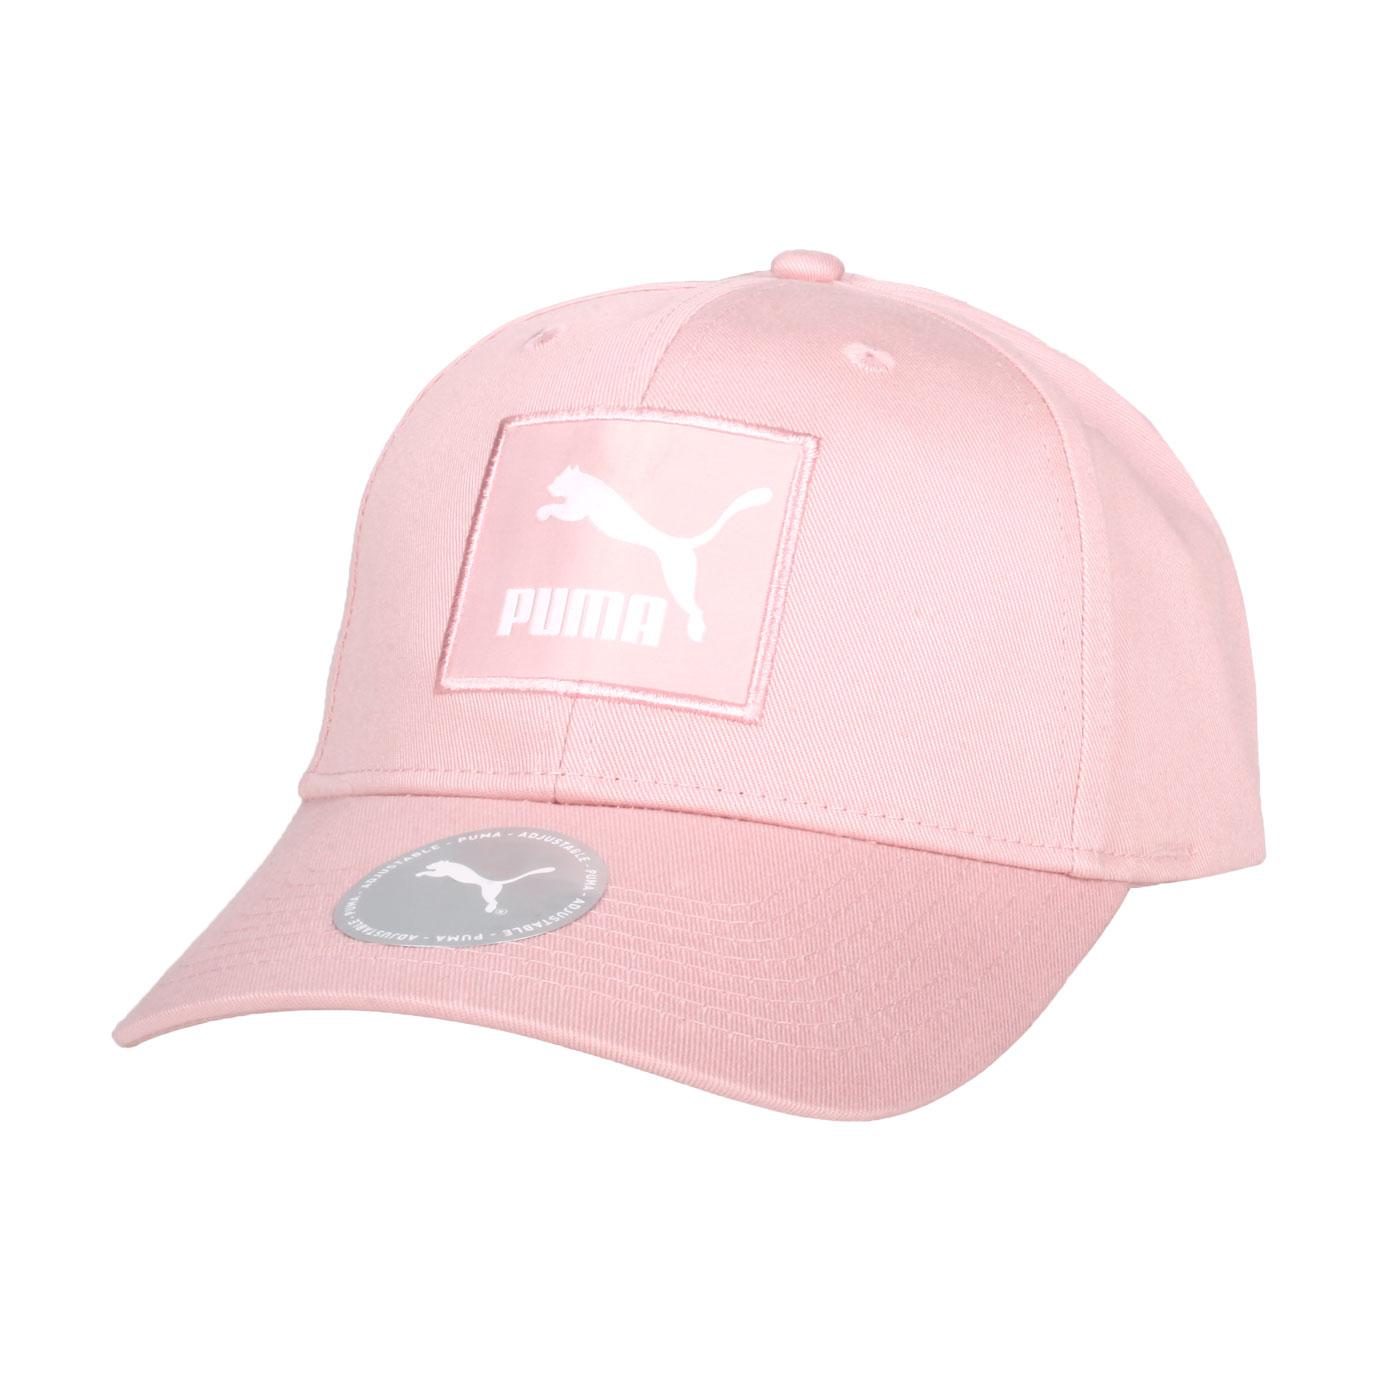 PUMA 流行系列織標LOGO棒球帽 02277808